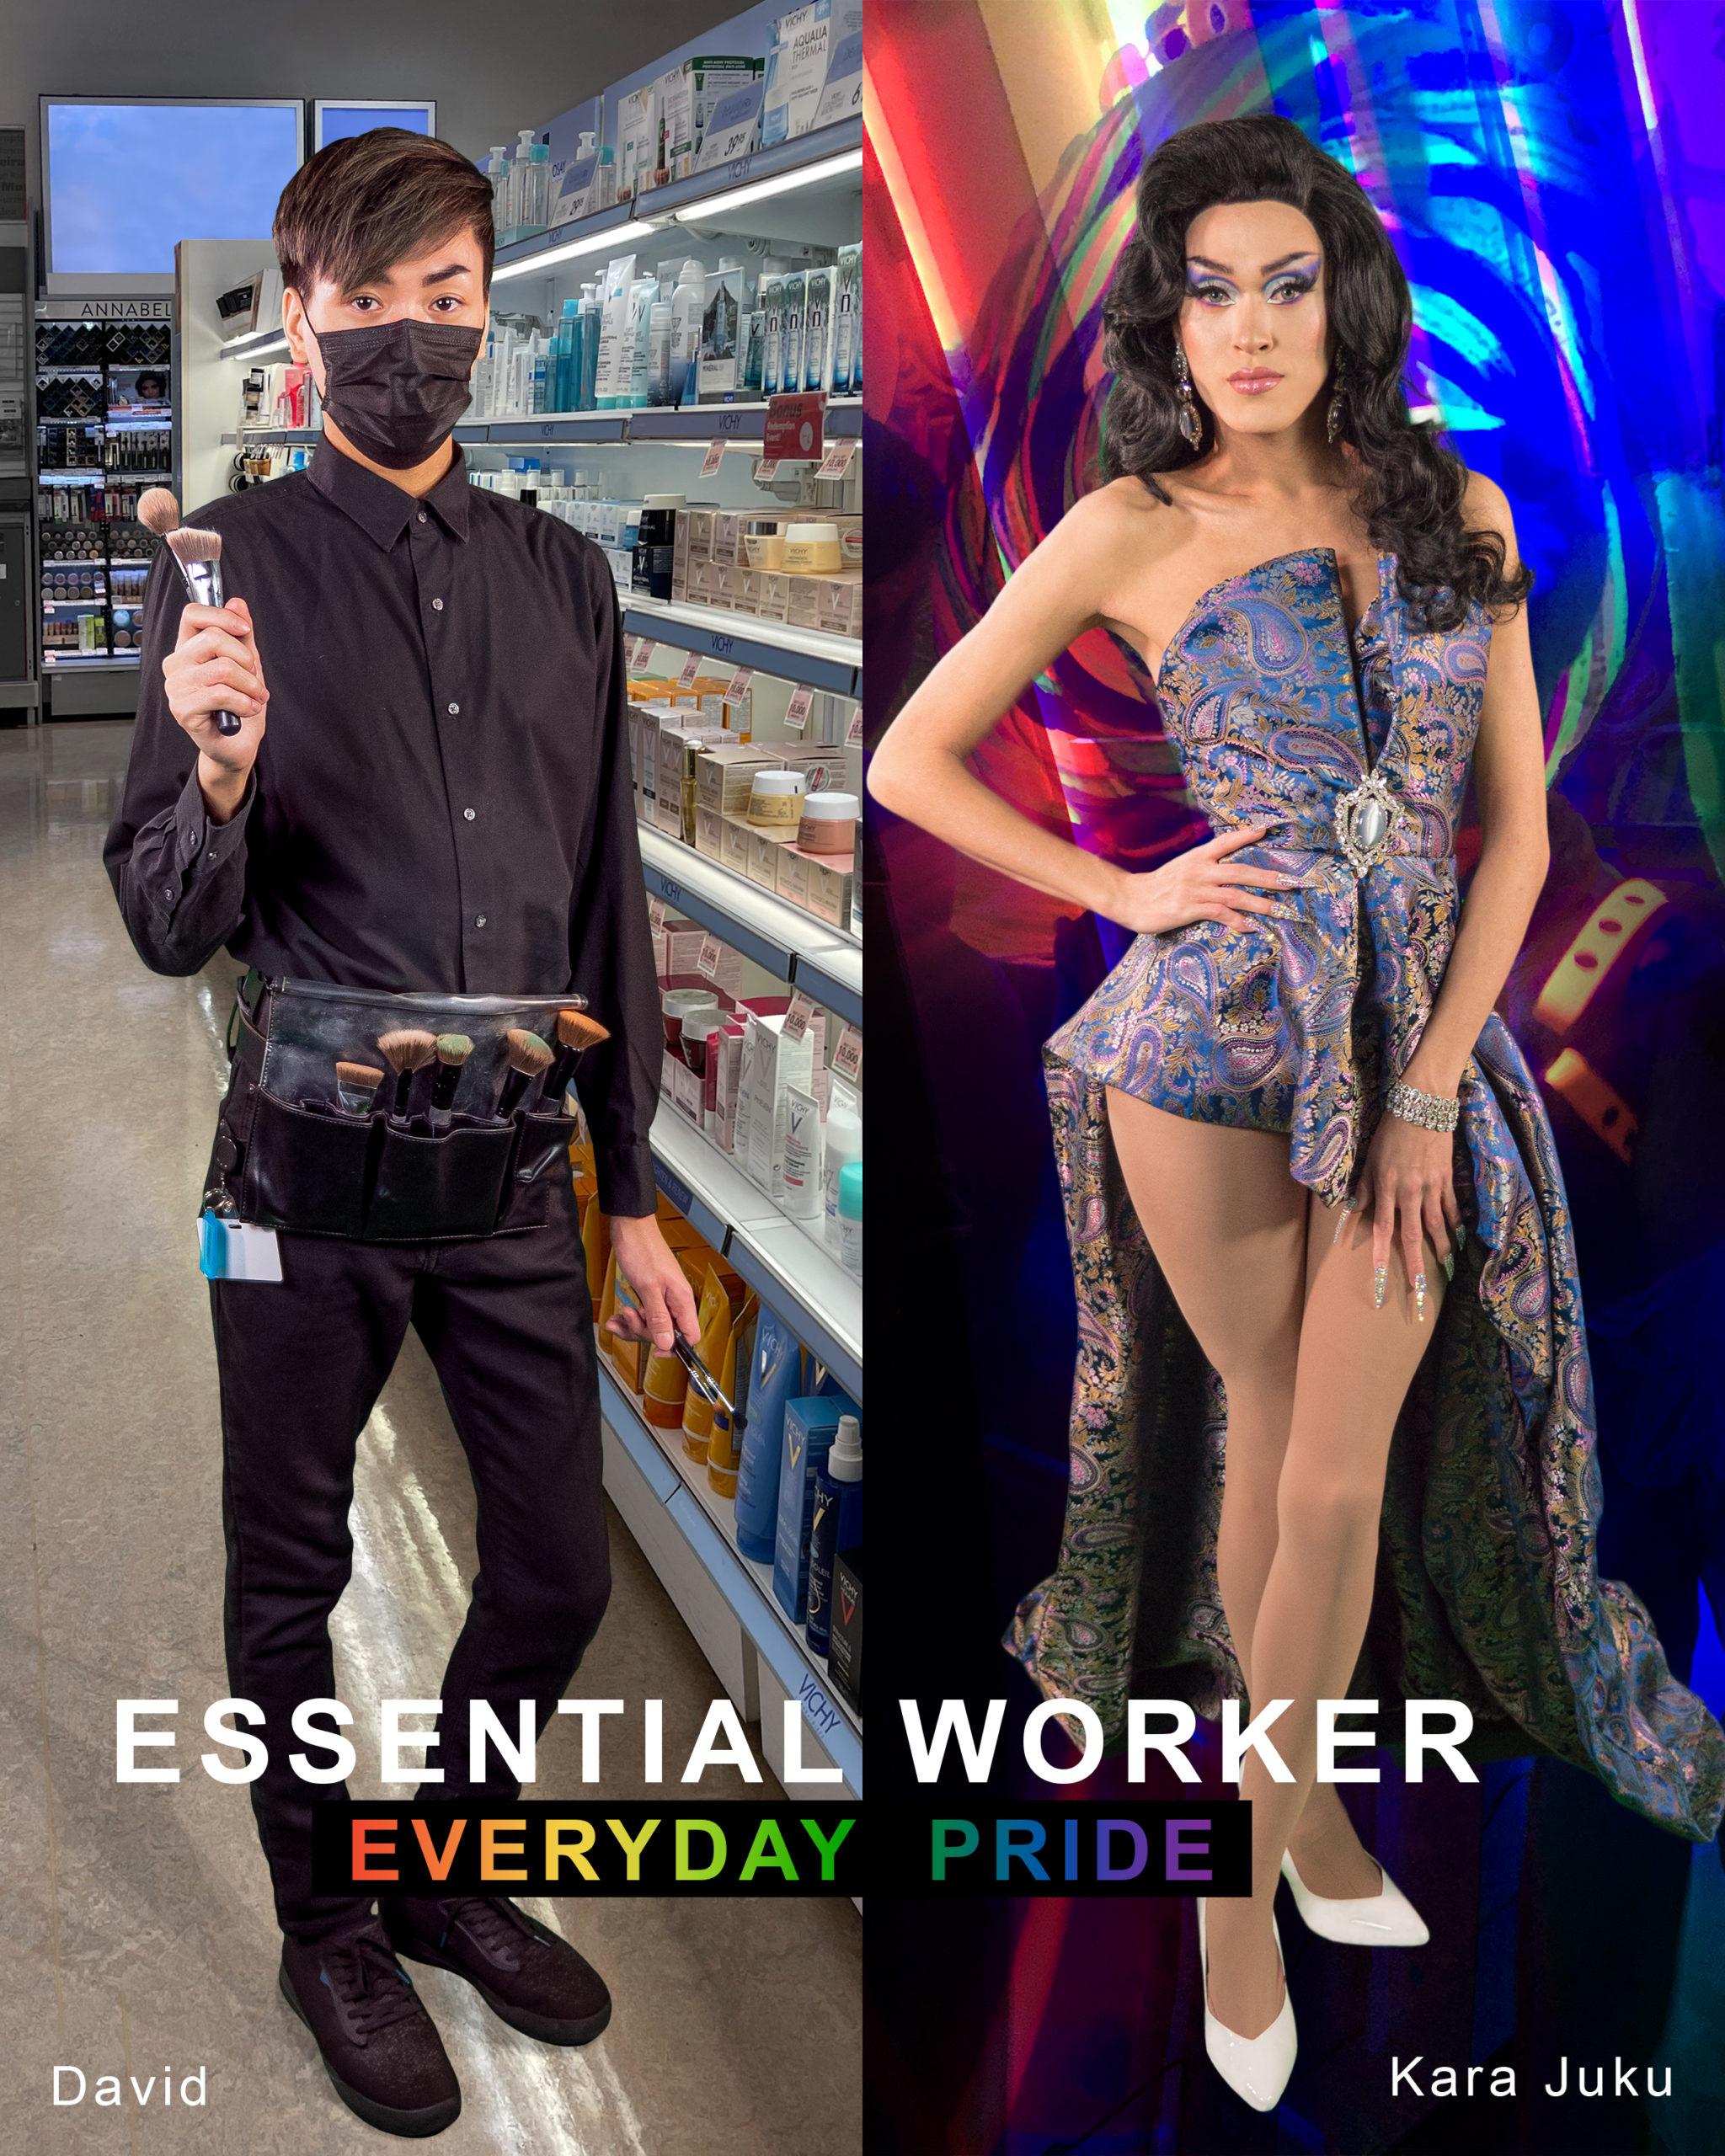 Essential Worker 2_David-Kara_ENG Master